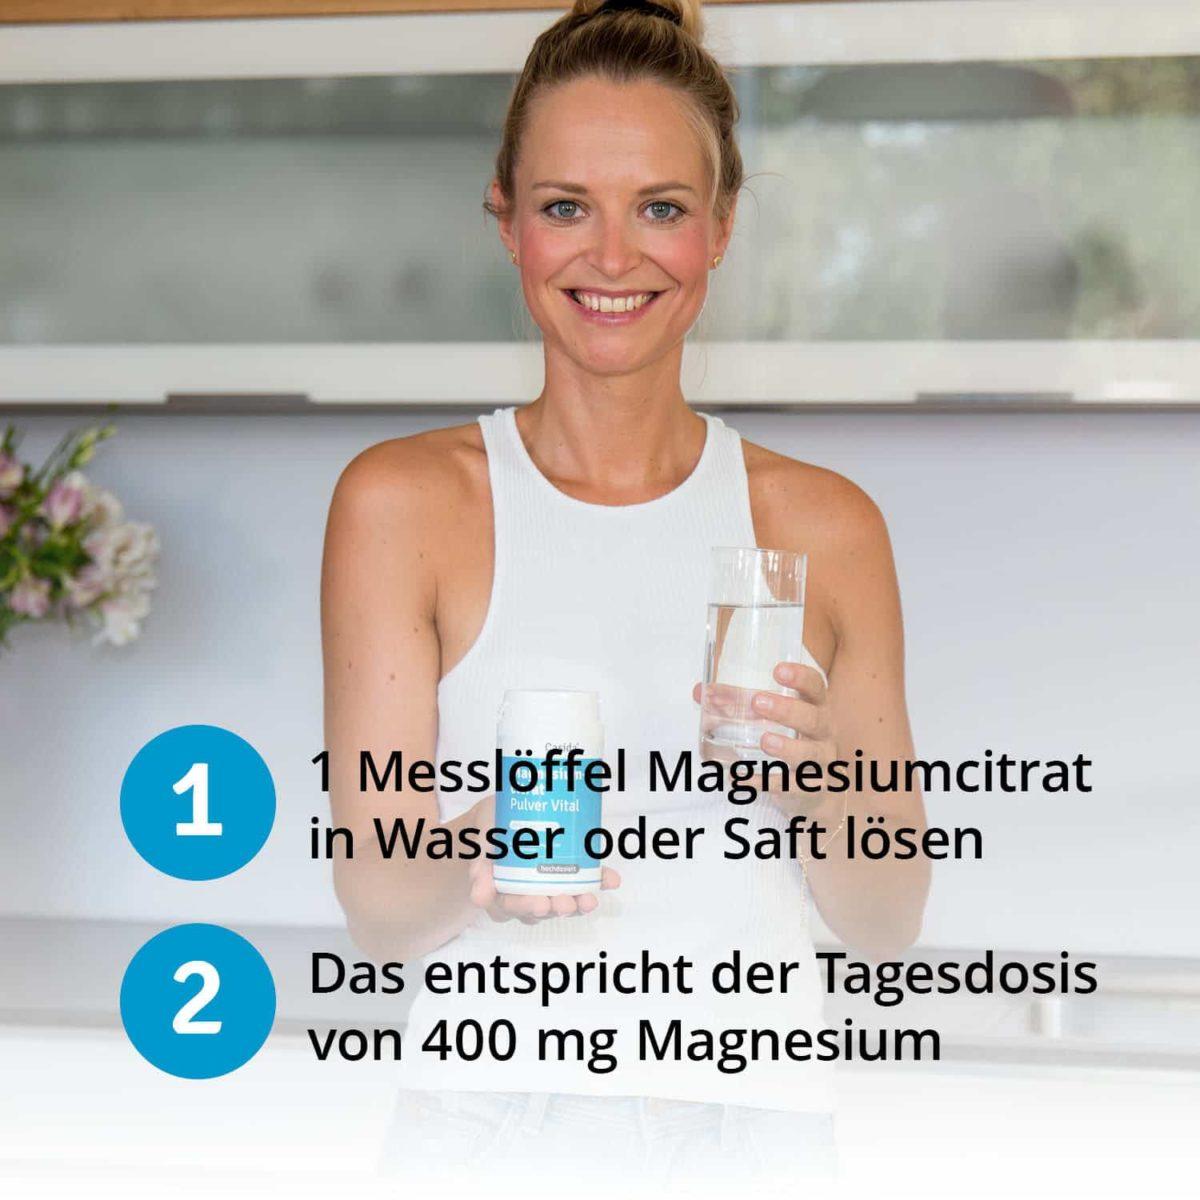 Casida Magnesiumcitrat Pulver Vital 200 g 11316290 PZN Apotheke Regeneration trinken Muskelentspannung6